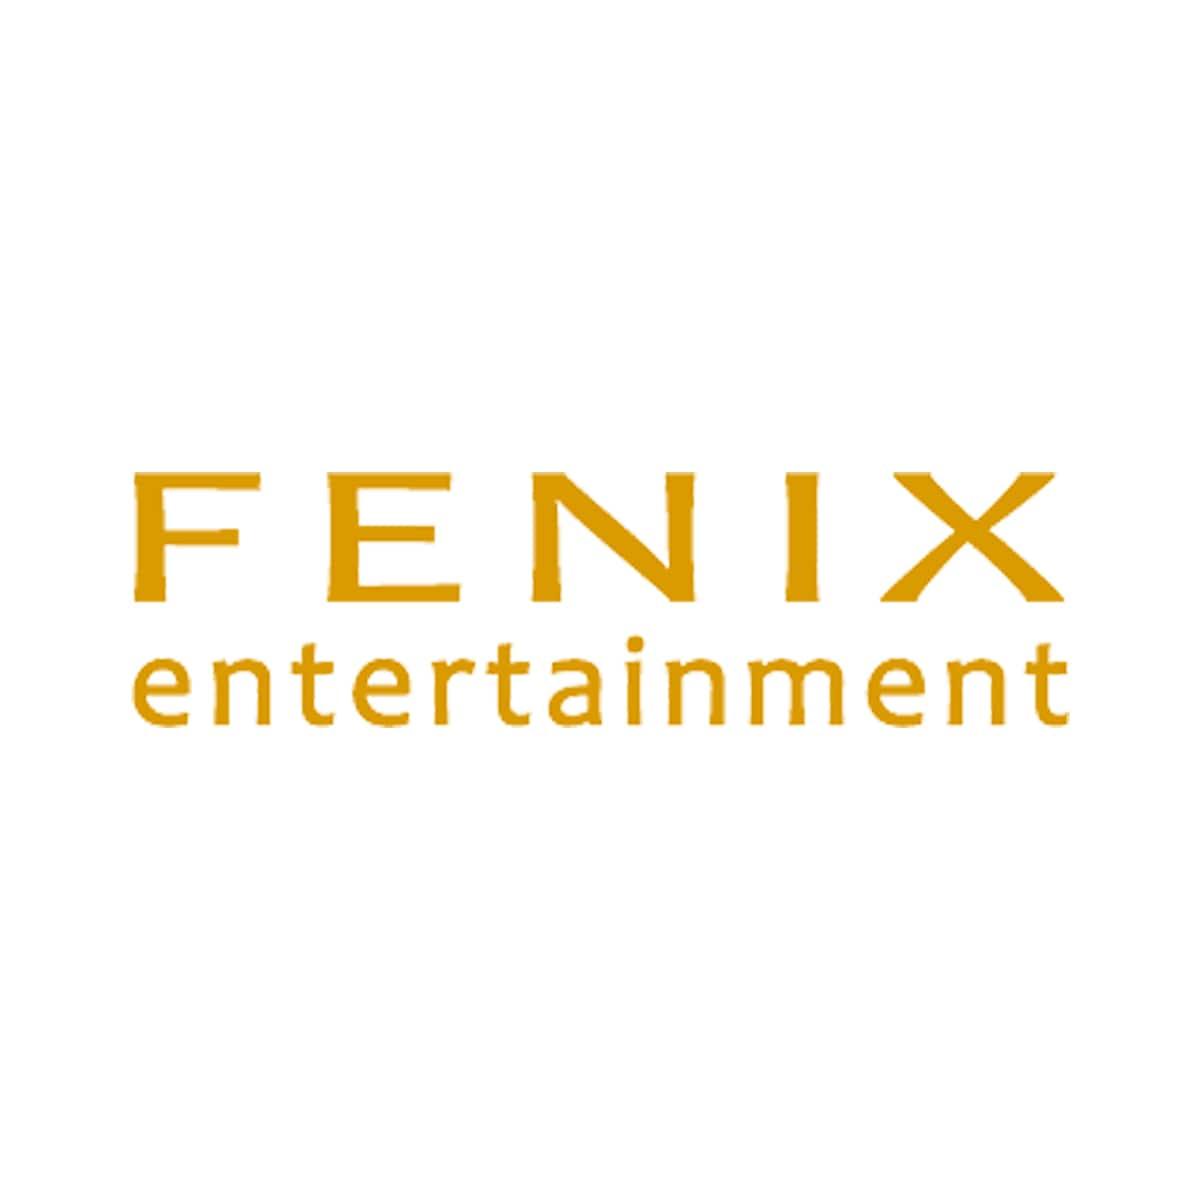 Fenix Entertainment, Borsa Italiana approva passaggio all'AIM Italia